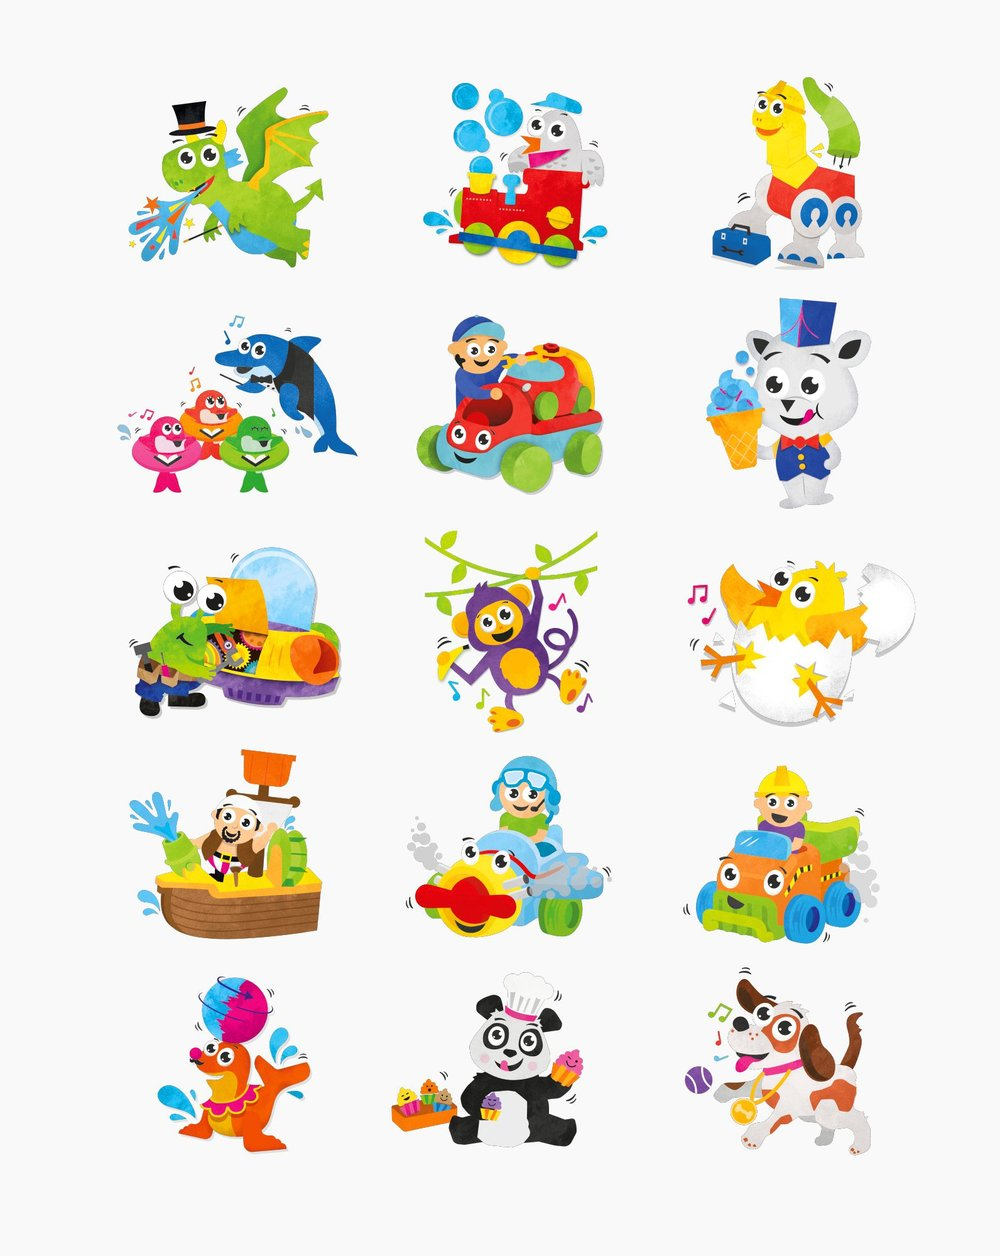 15Tomy_Characters3.jpg